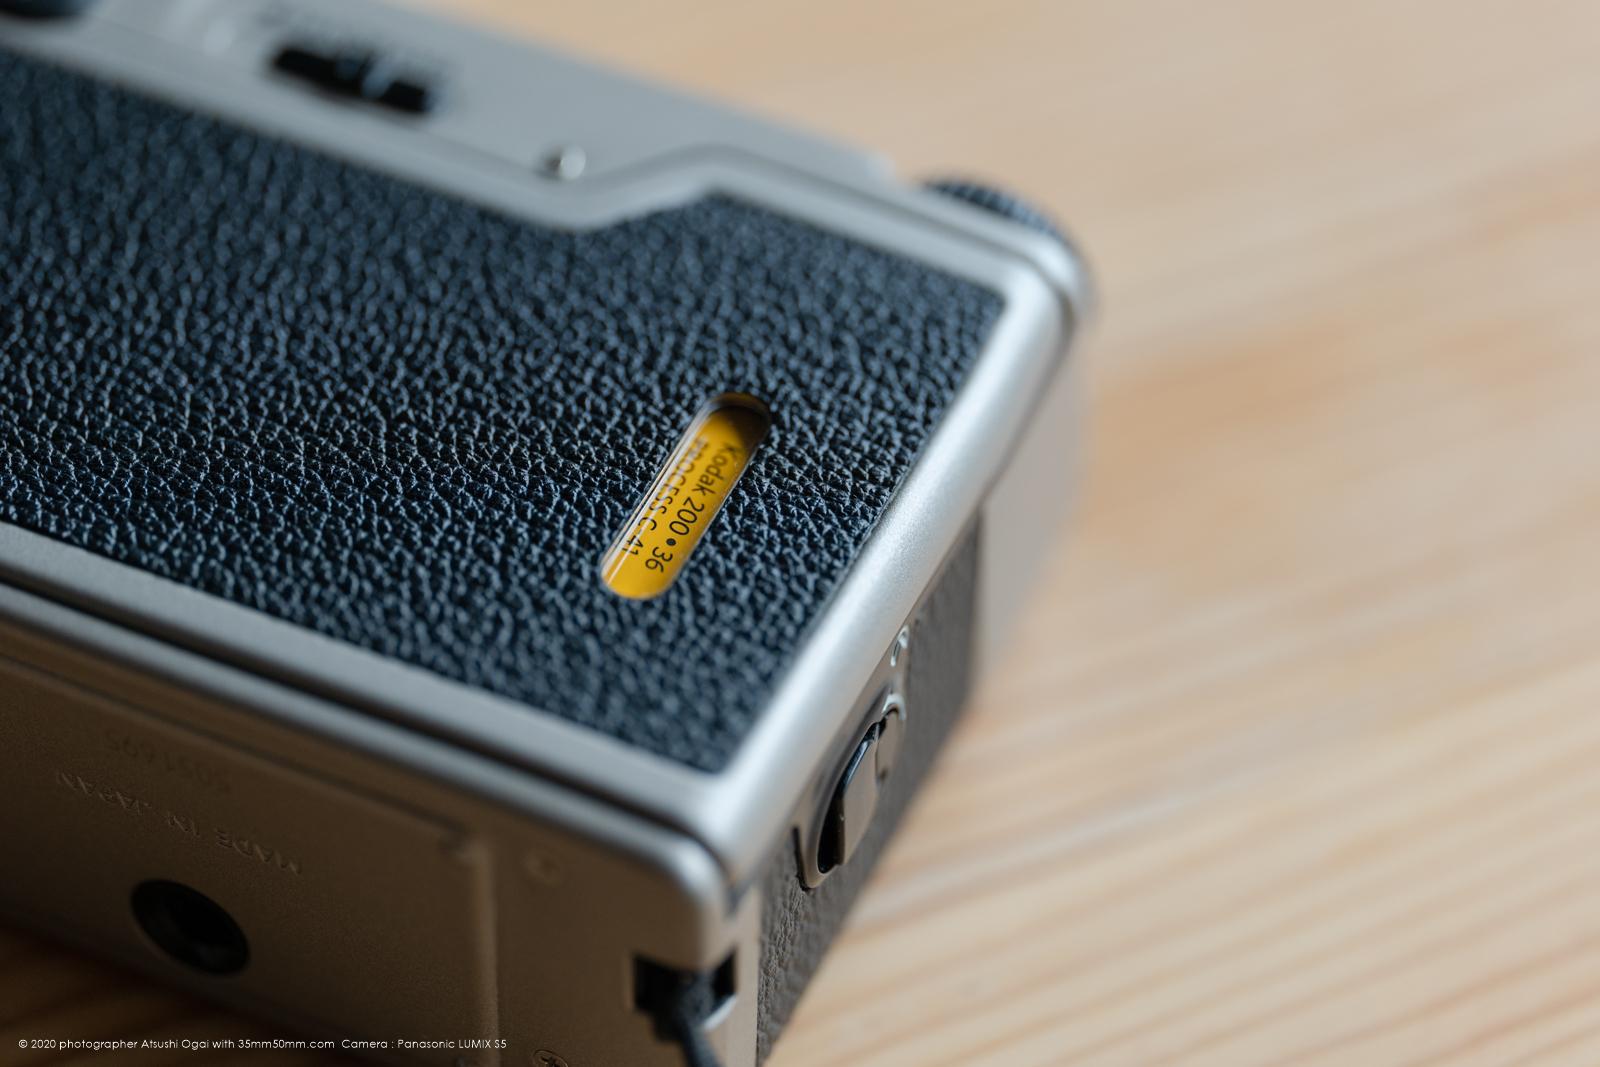 Nikon 35Tiの画像です